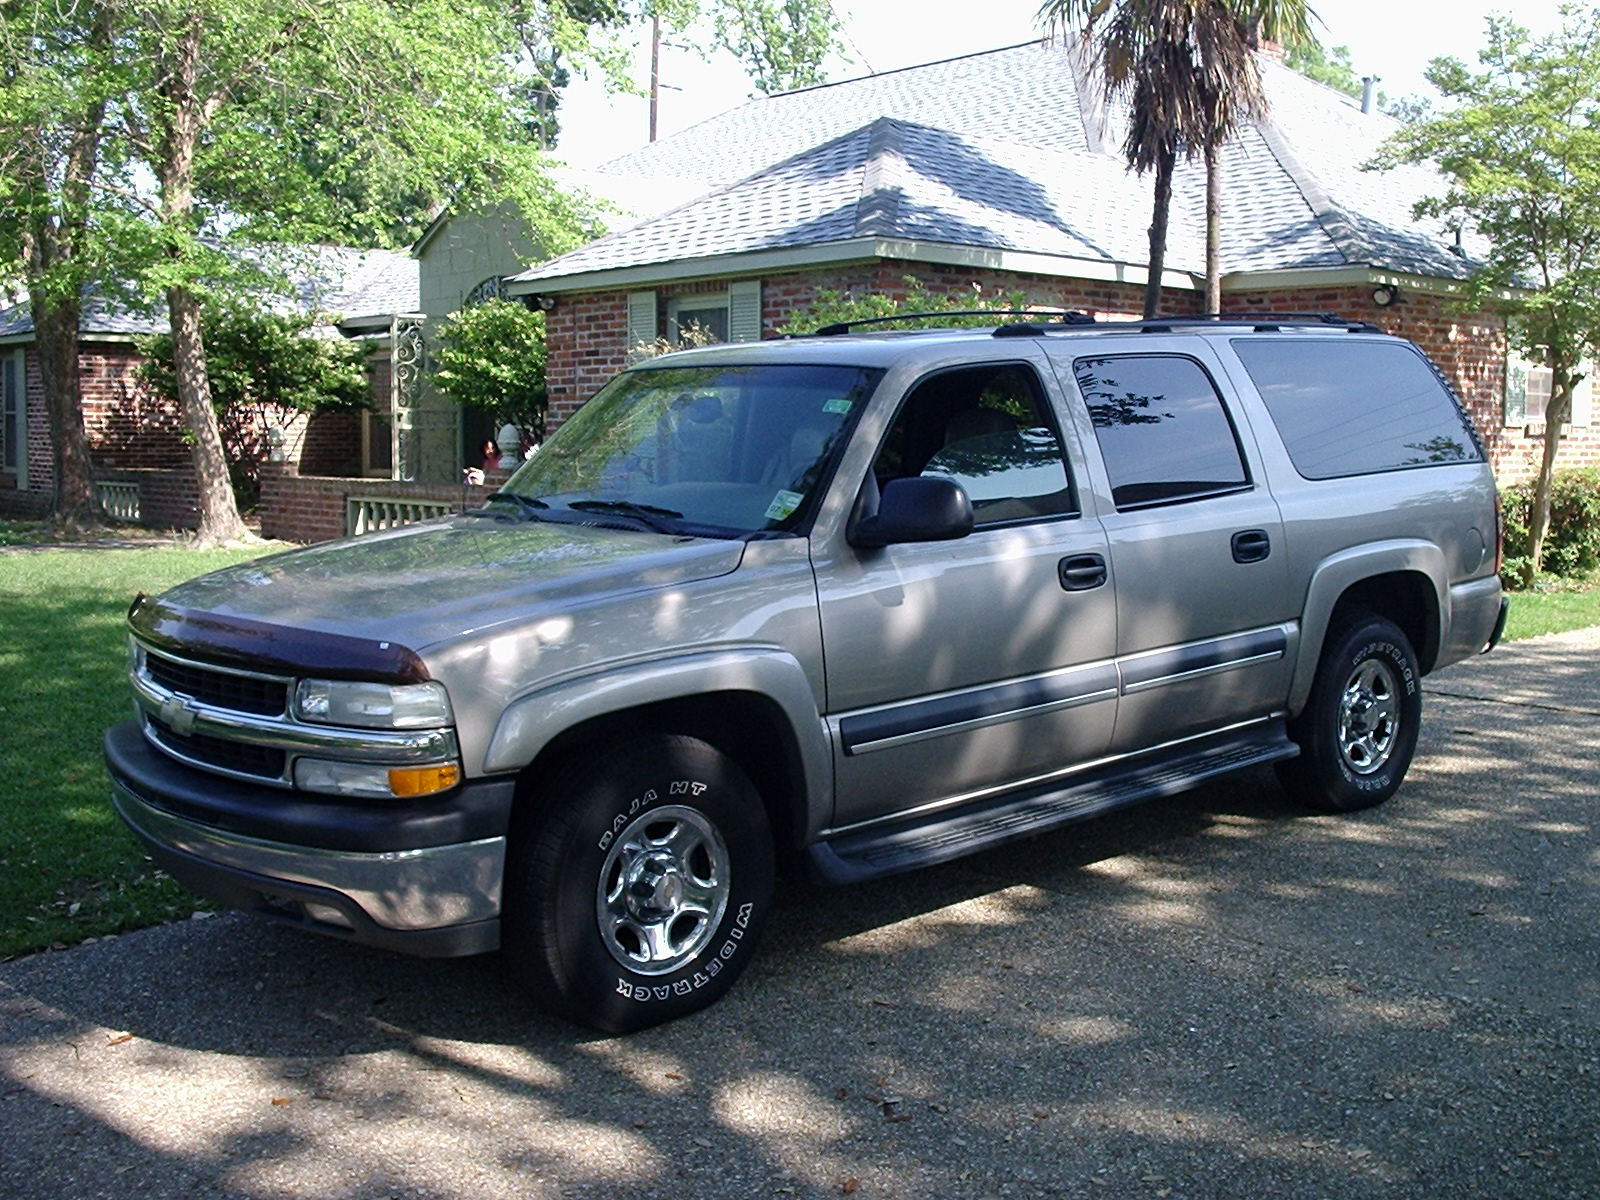 Chevrolet suburban 1500 photo gallery